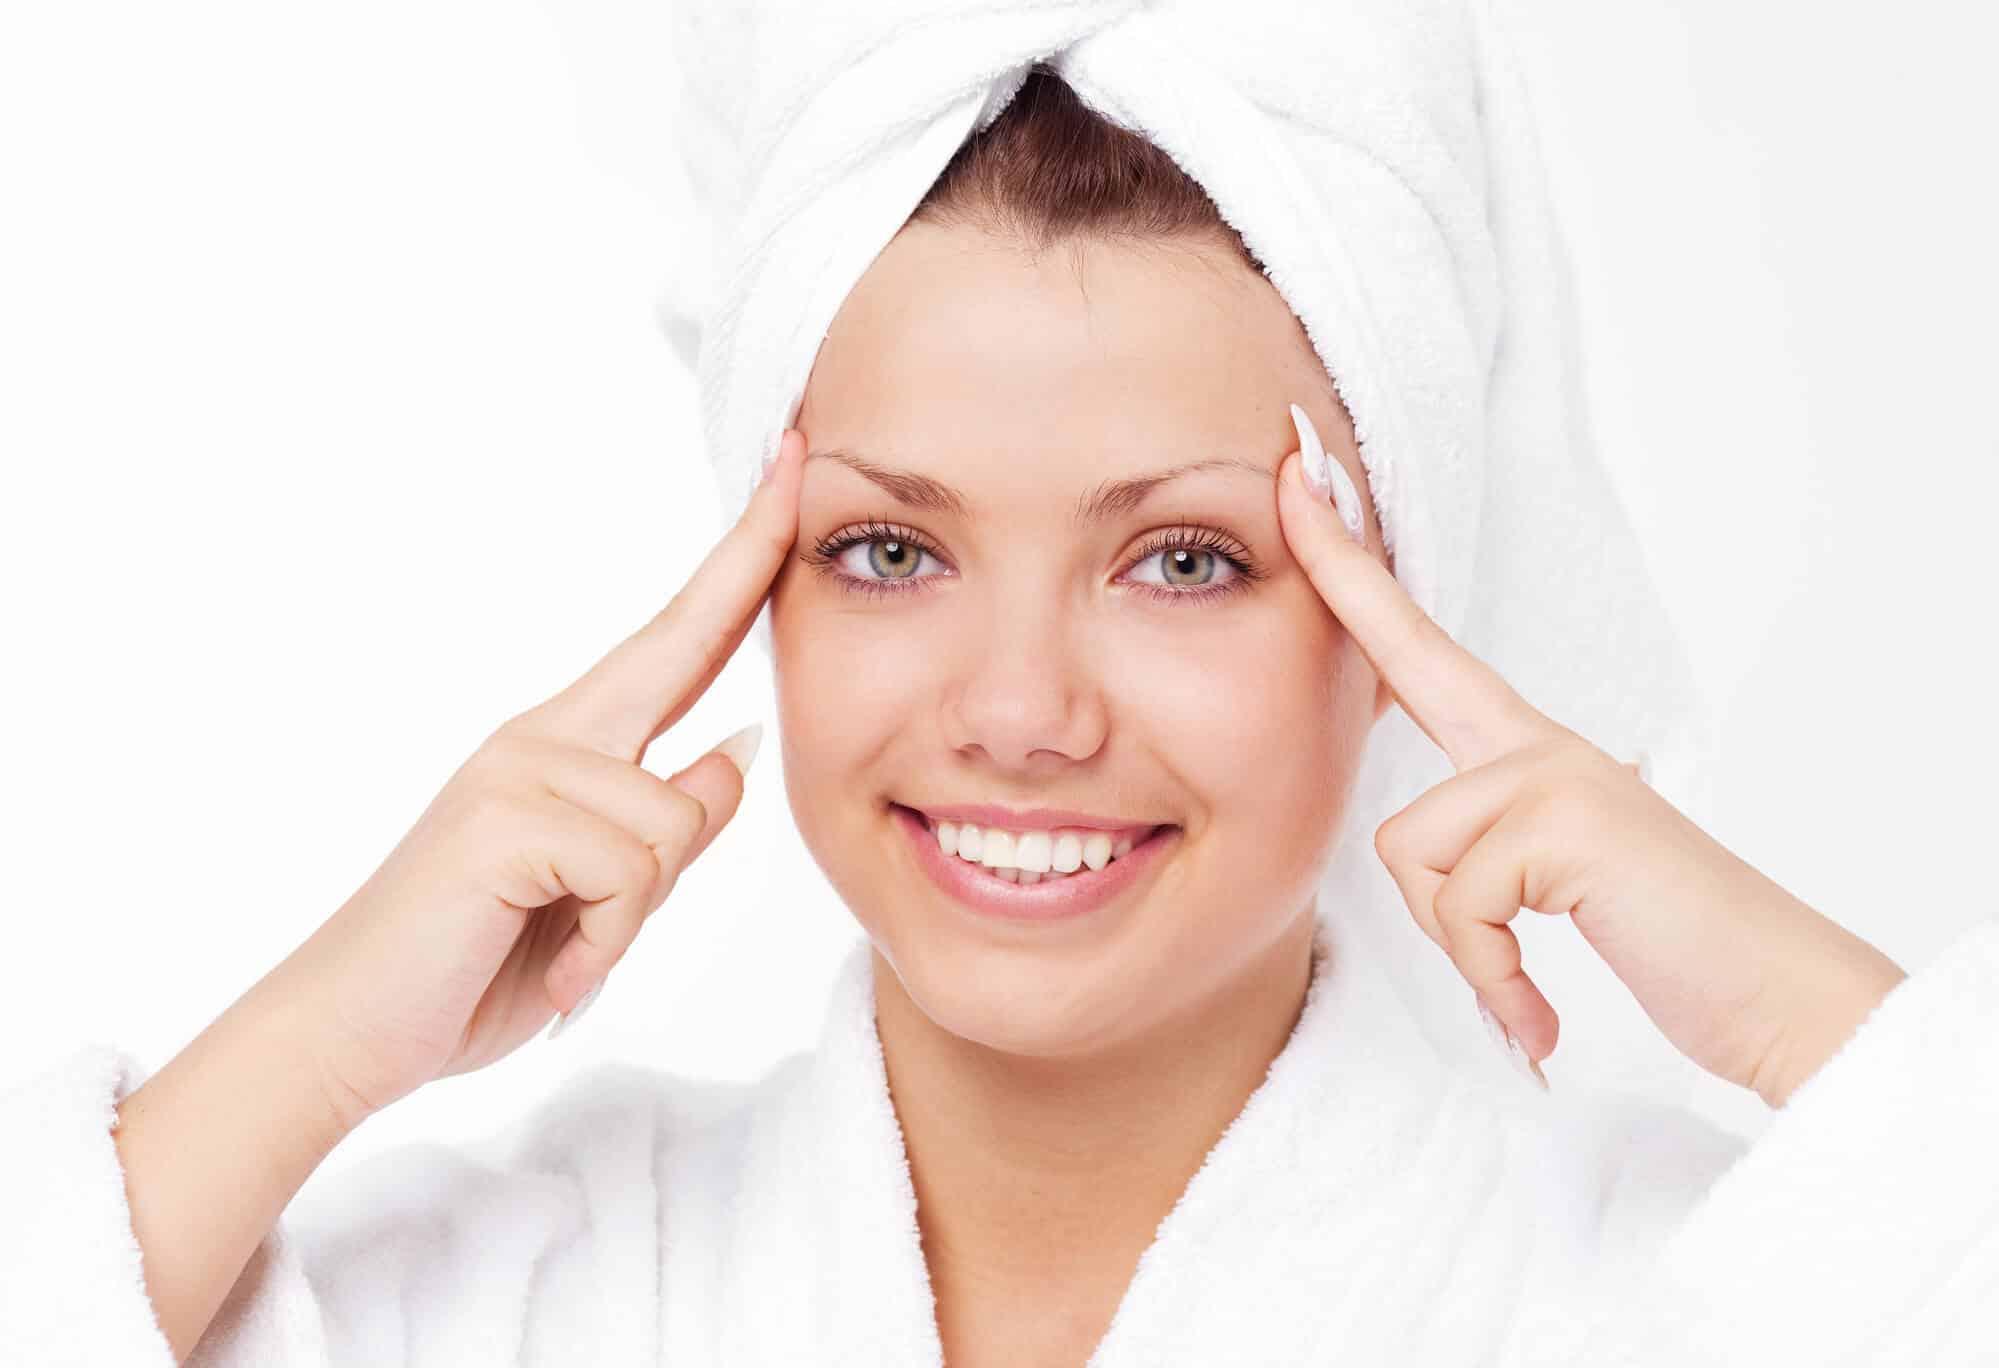 woman giving herself a head self-massage